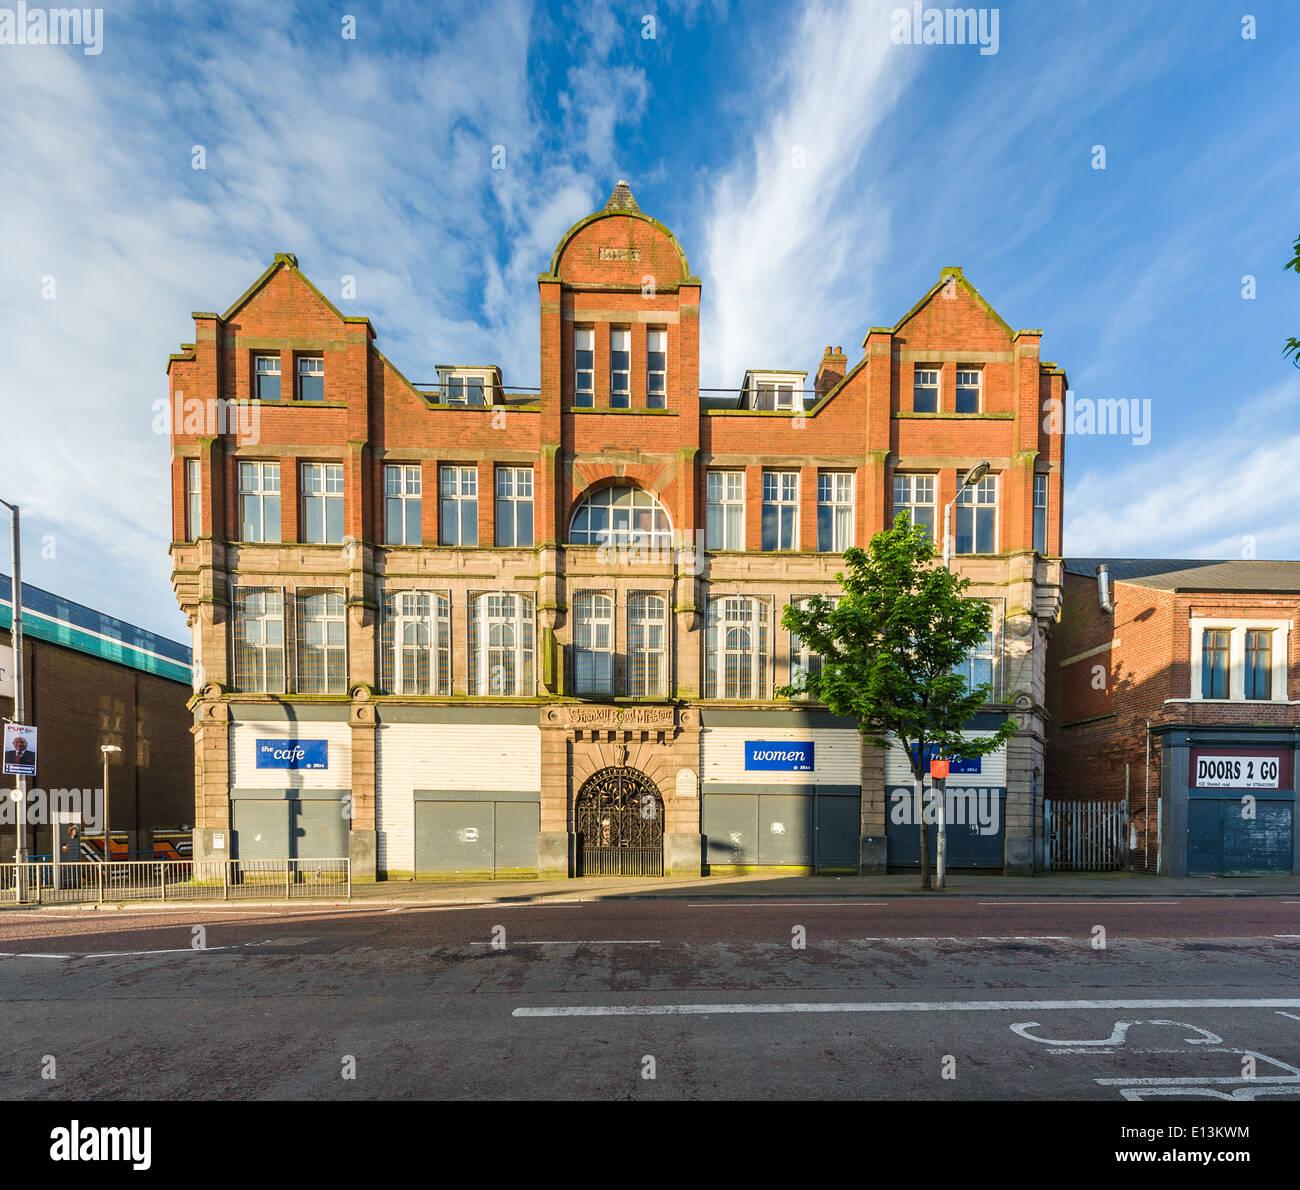 Shankill Road Mission, Shankill Road, Belfast, Northern Ireland - Stock Image